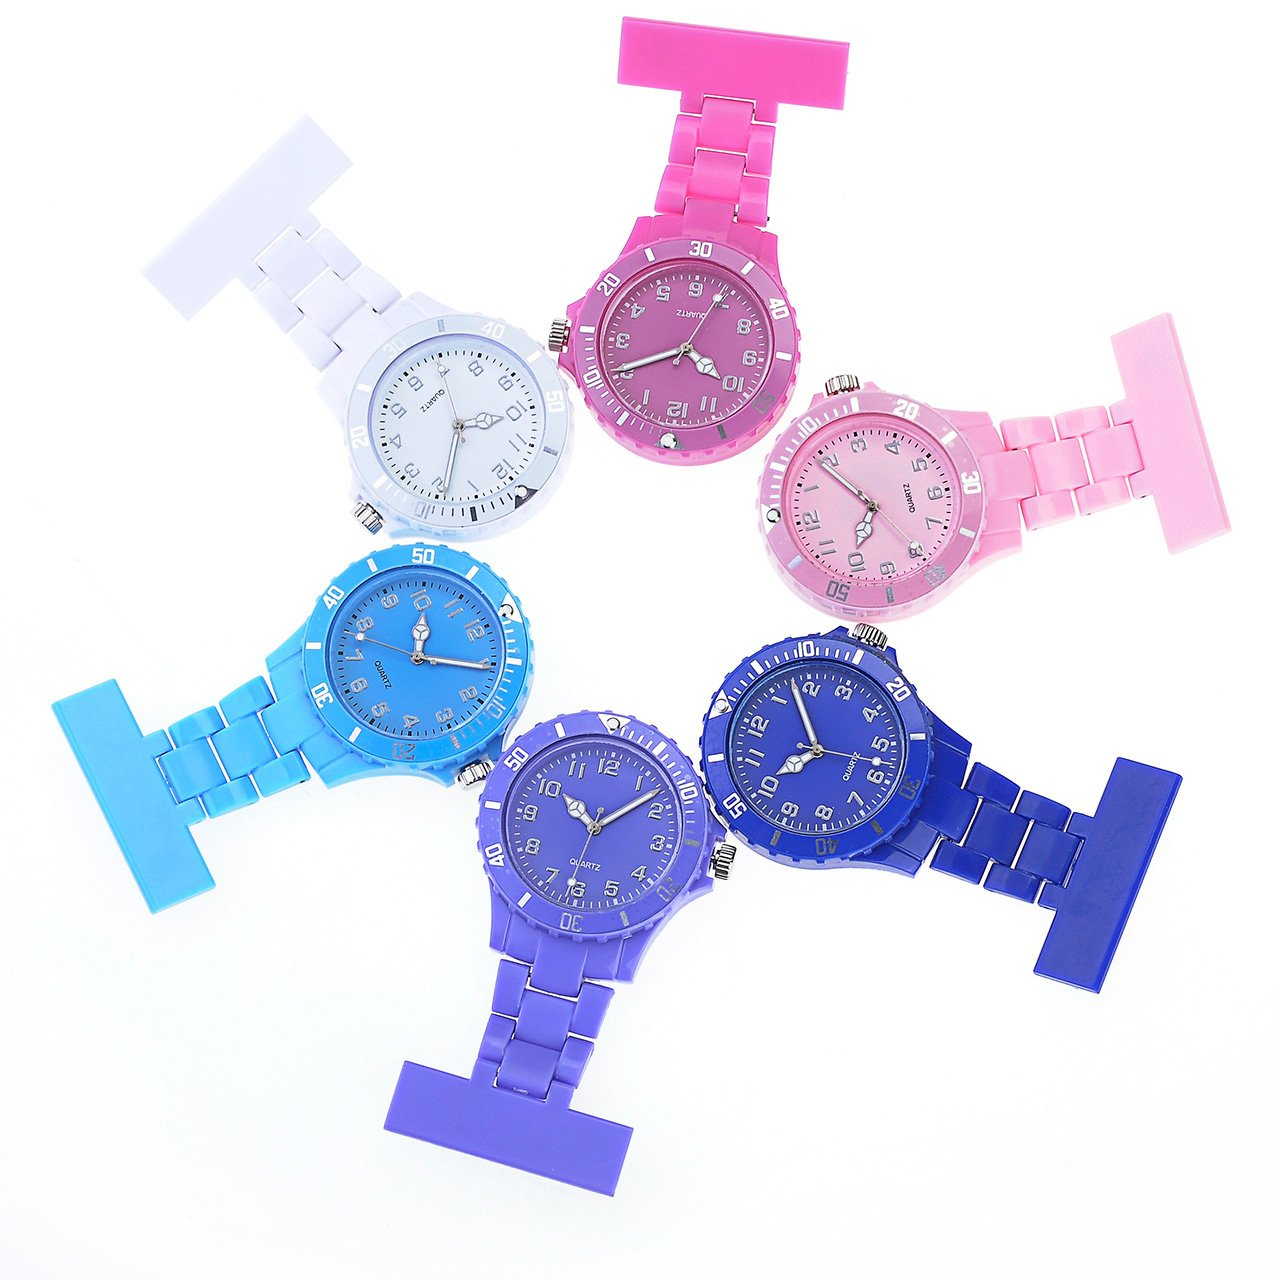 Top Plaza Women's Fashion Nurse Clip-on Fob Brooch Lapel Pocket Watch, Pack of 6